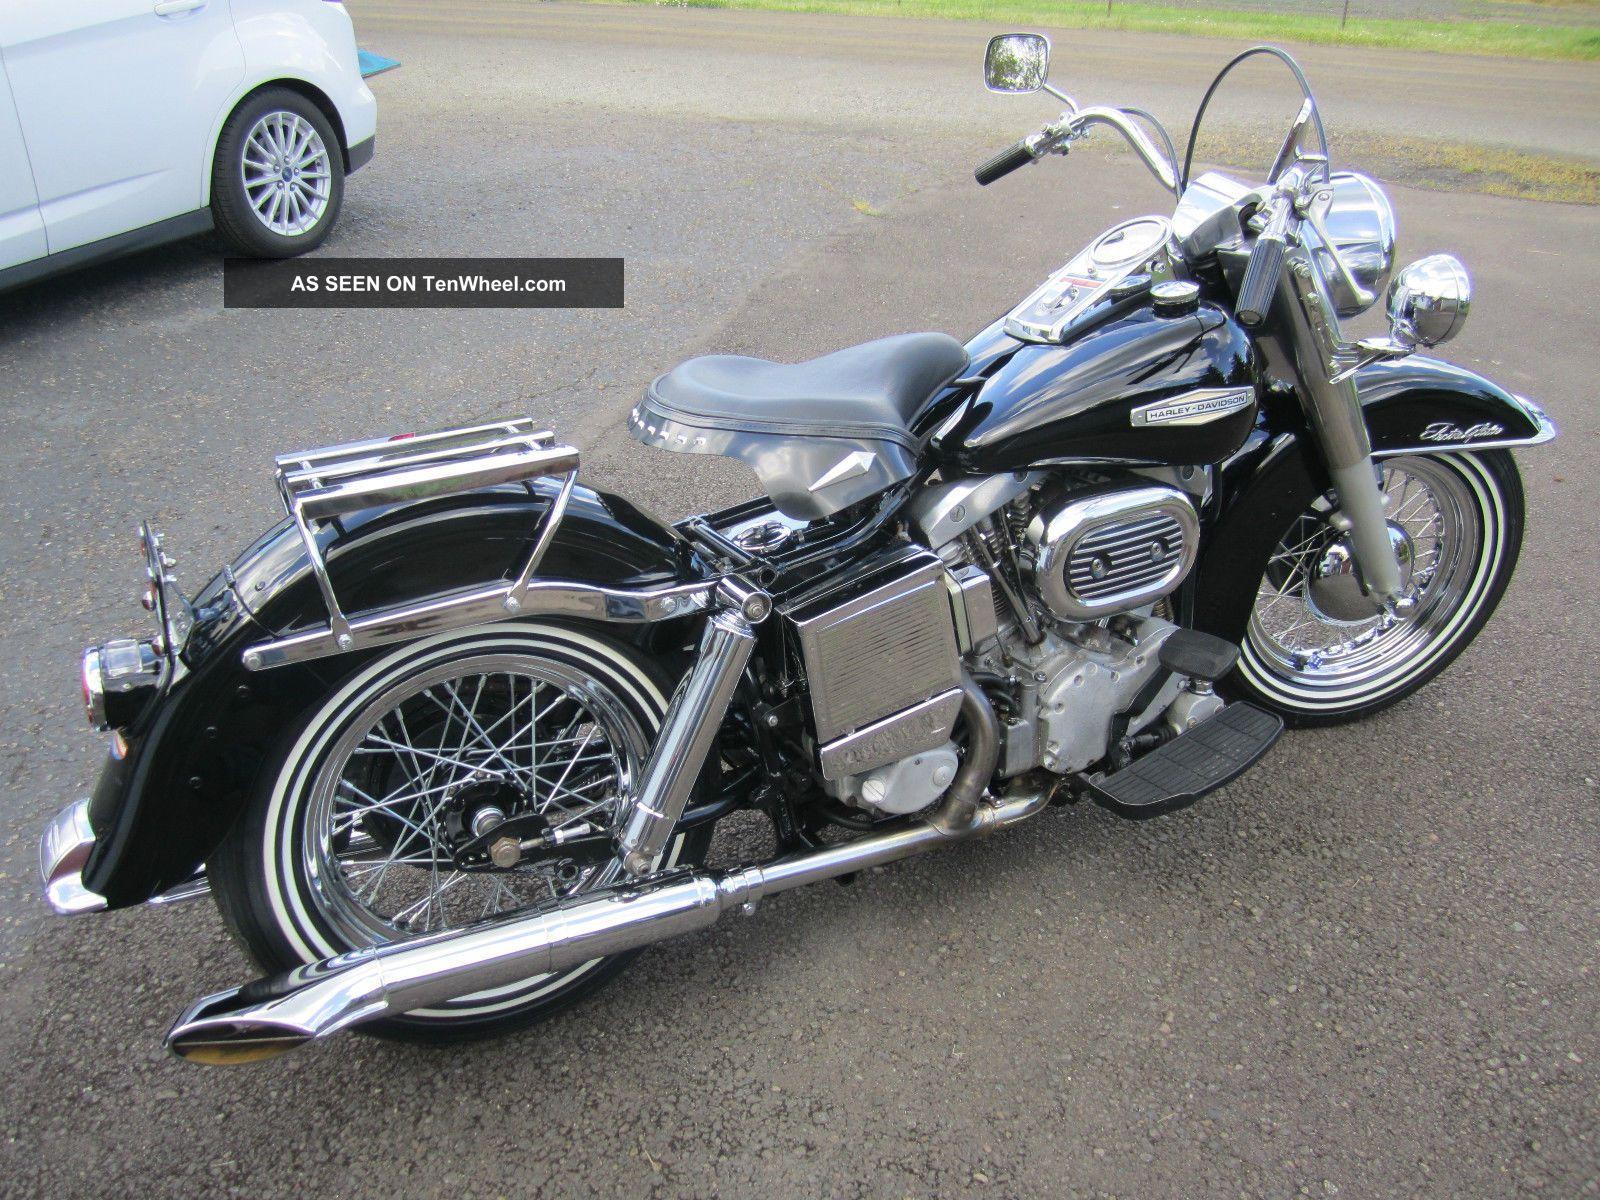 Harley Davidson 1969 Flh Electra - Glide Other photo